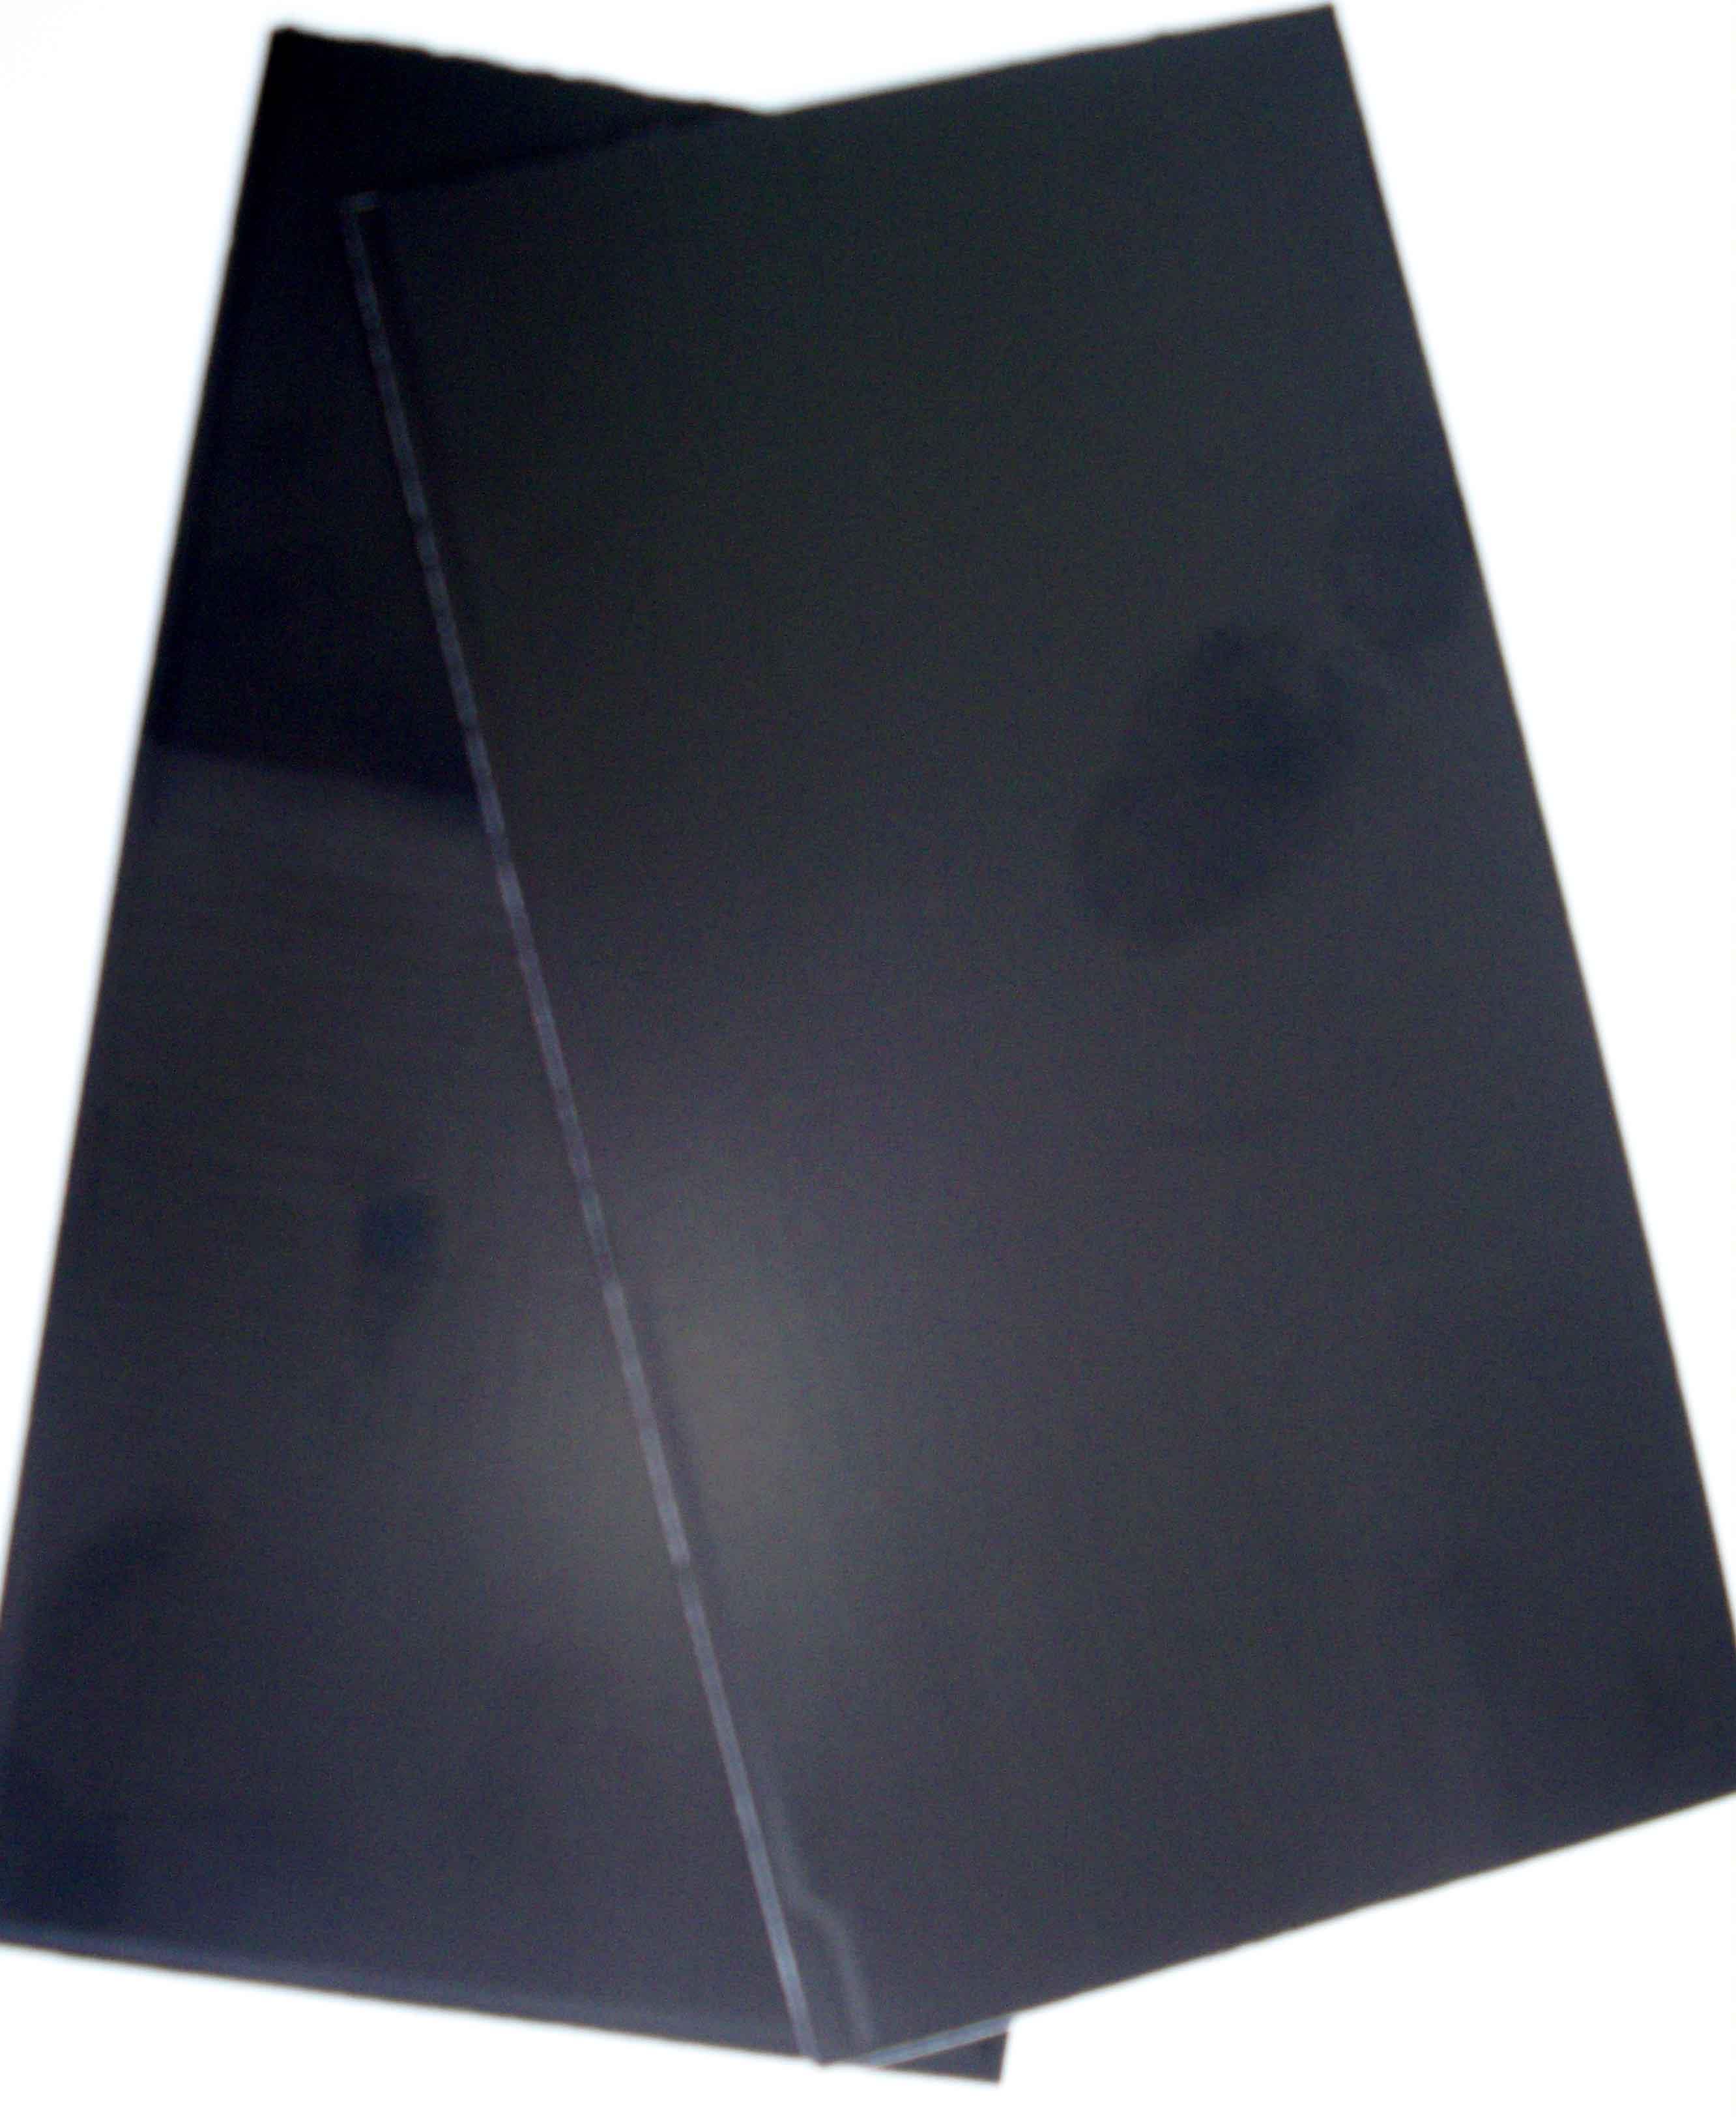 高性能13.56MHZ铁氧体片